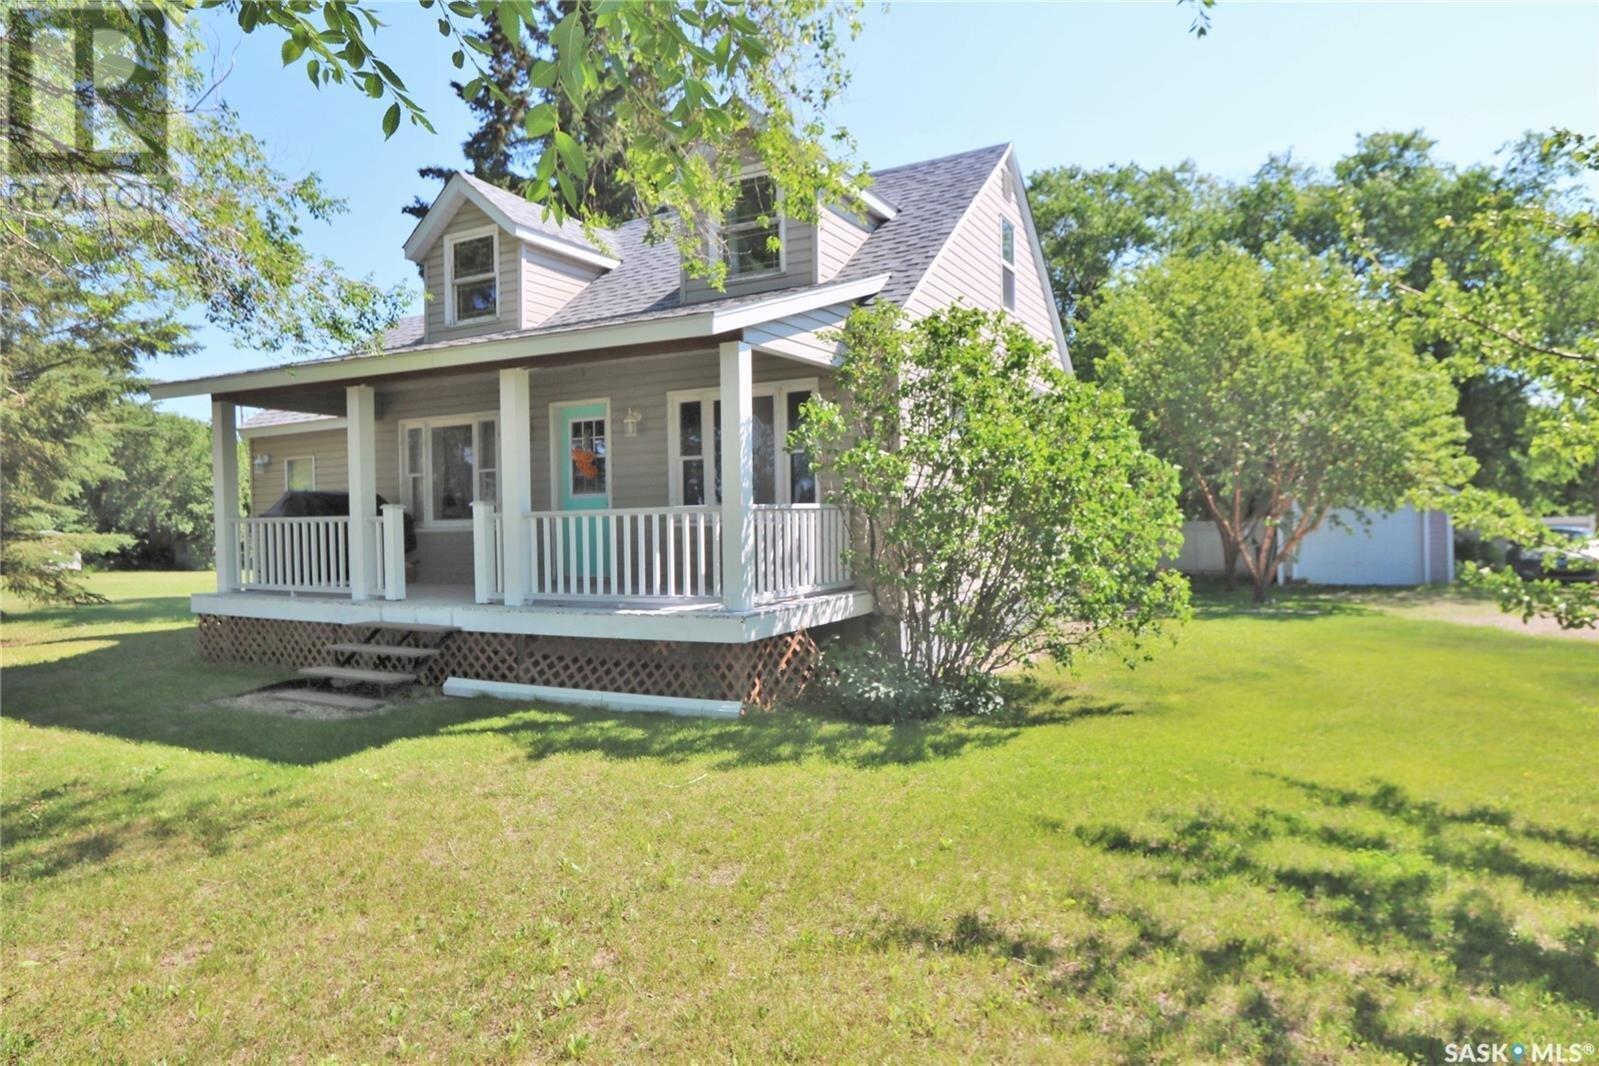 House for sale at 79 Lawrence Ave E Yorkton Saskatchewan - MLS: SK818794